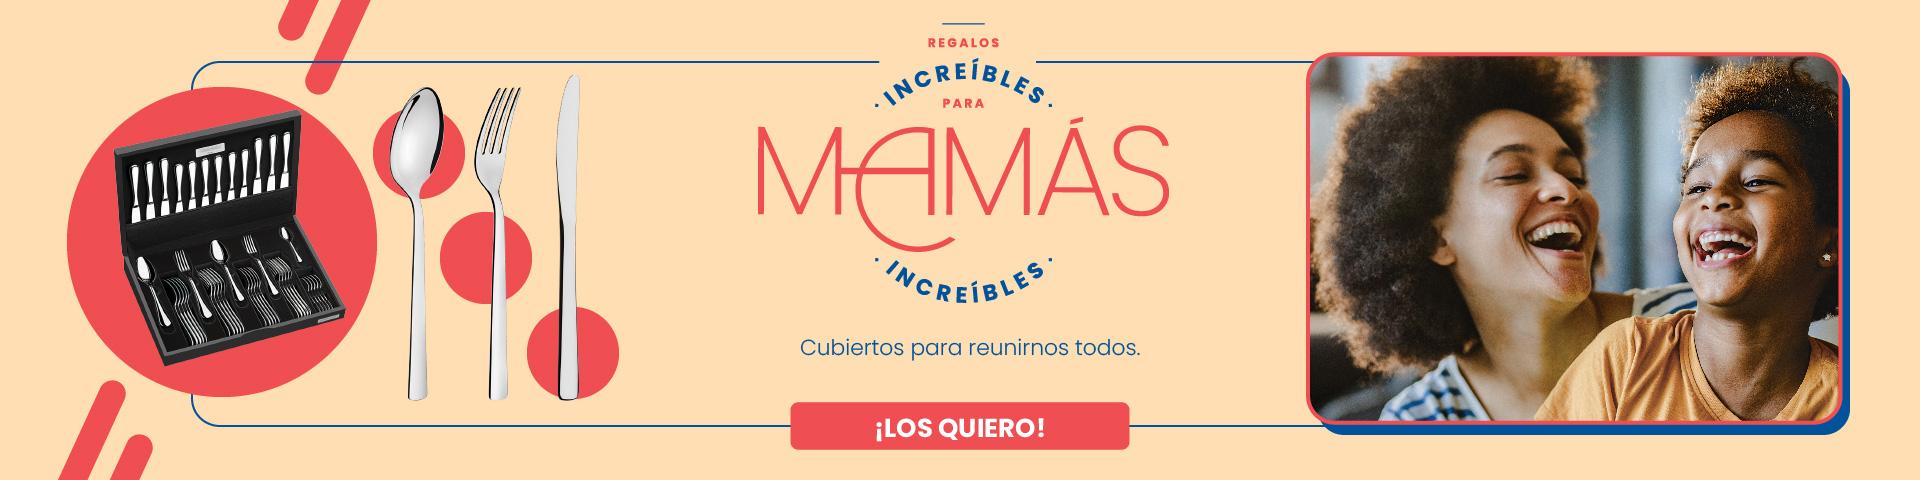 Cubiertos Mamas